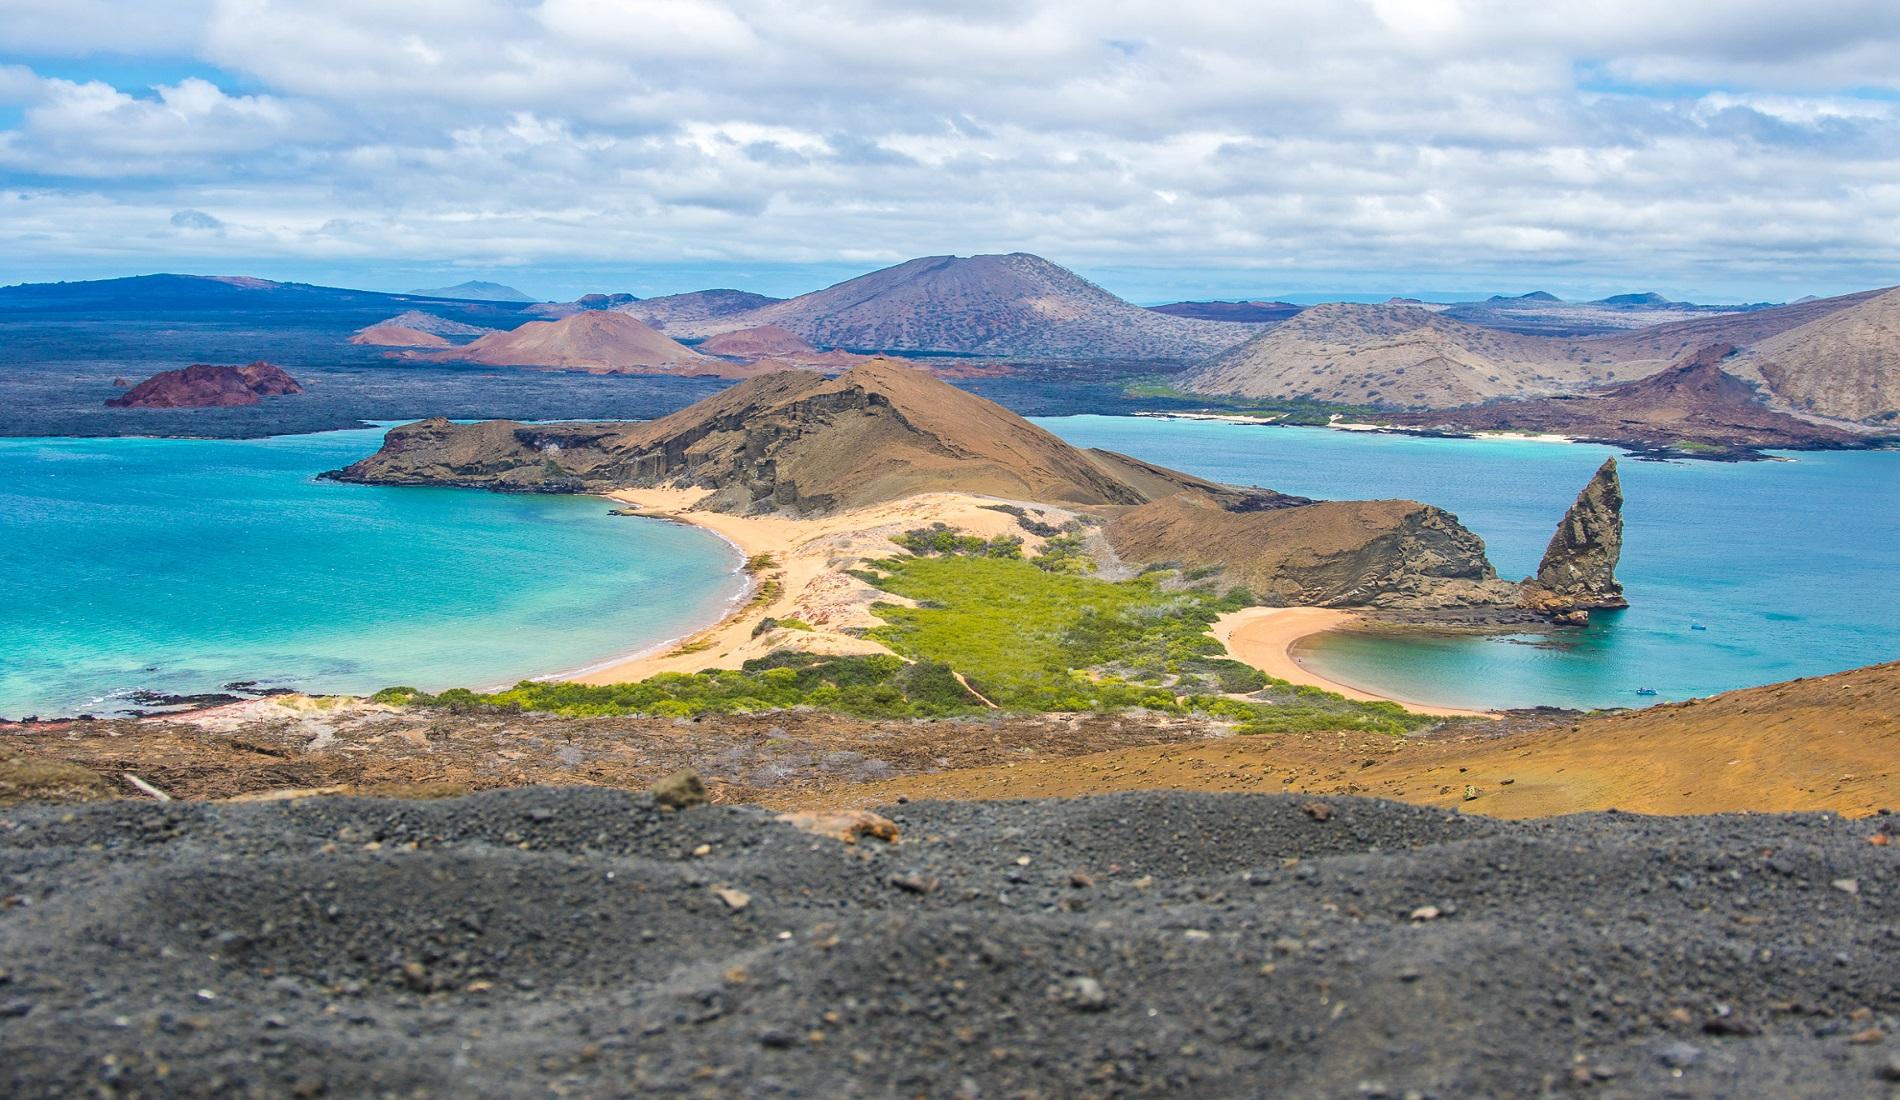 Galapagos eilanden Bartolome & Pinnacle Rock